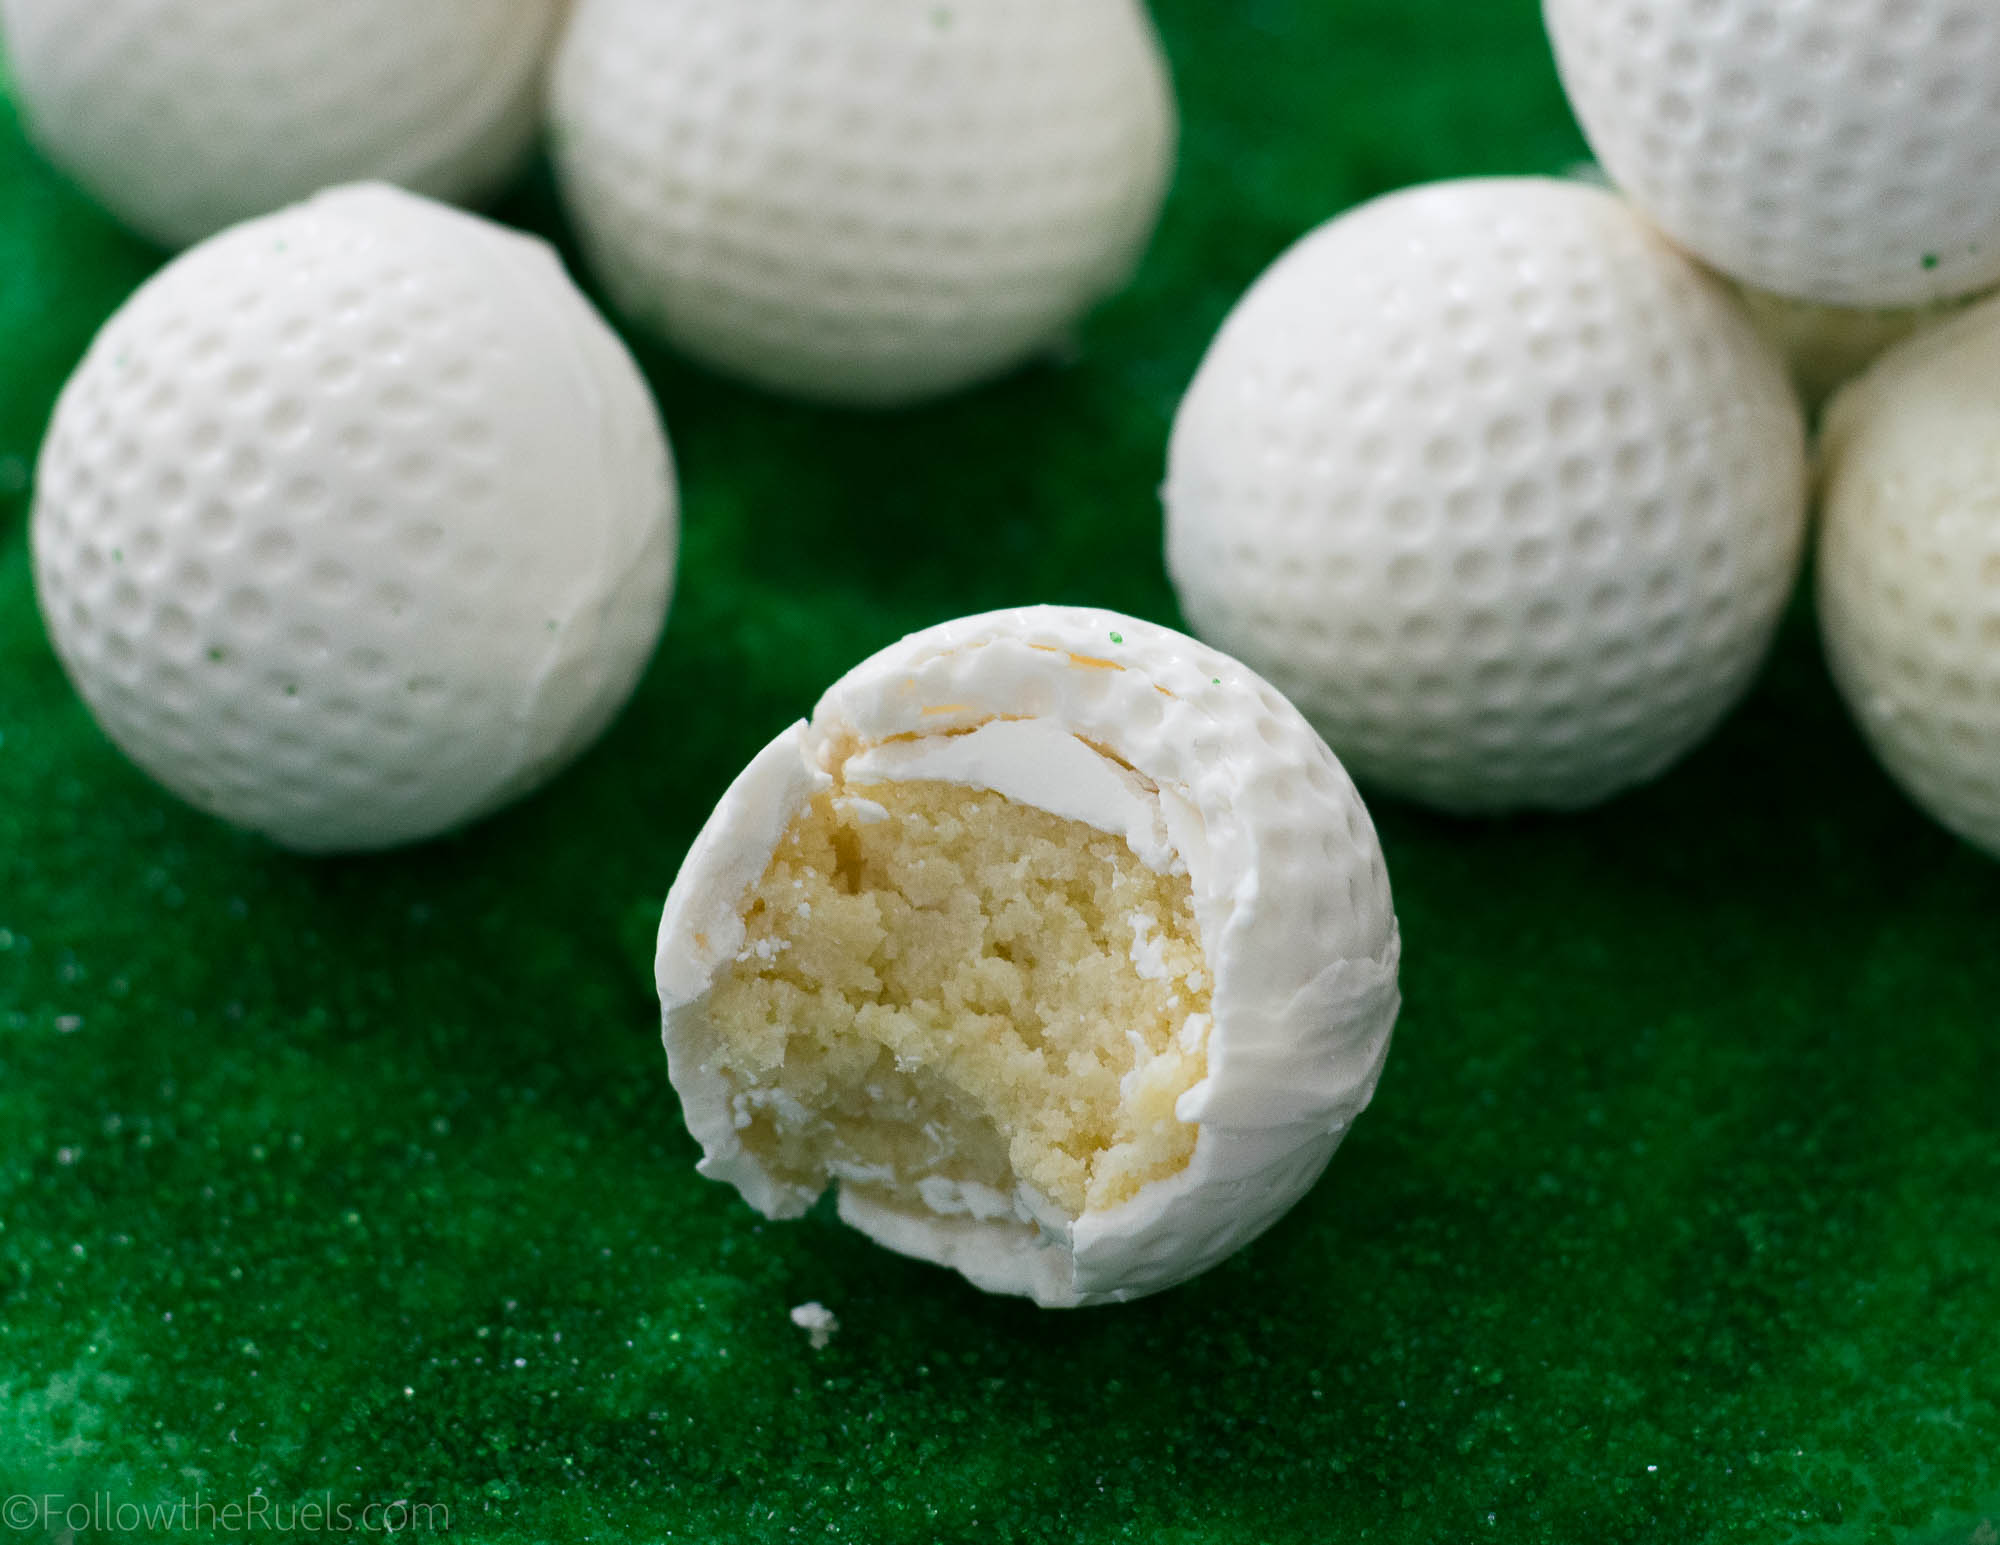 Golf-Cake-Balls-7.jpg